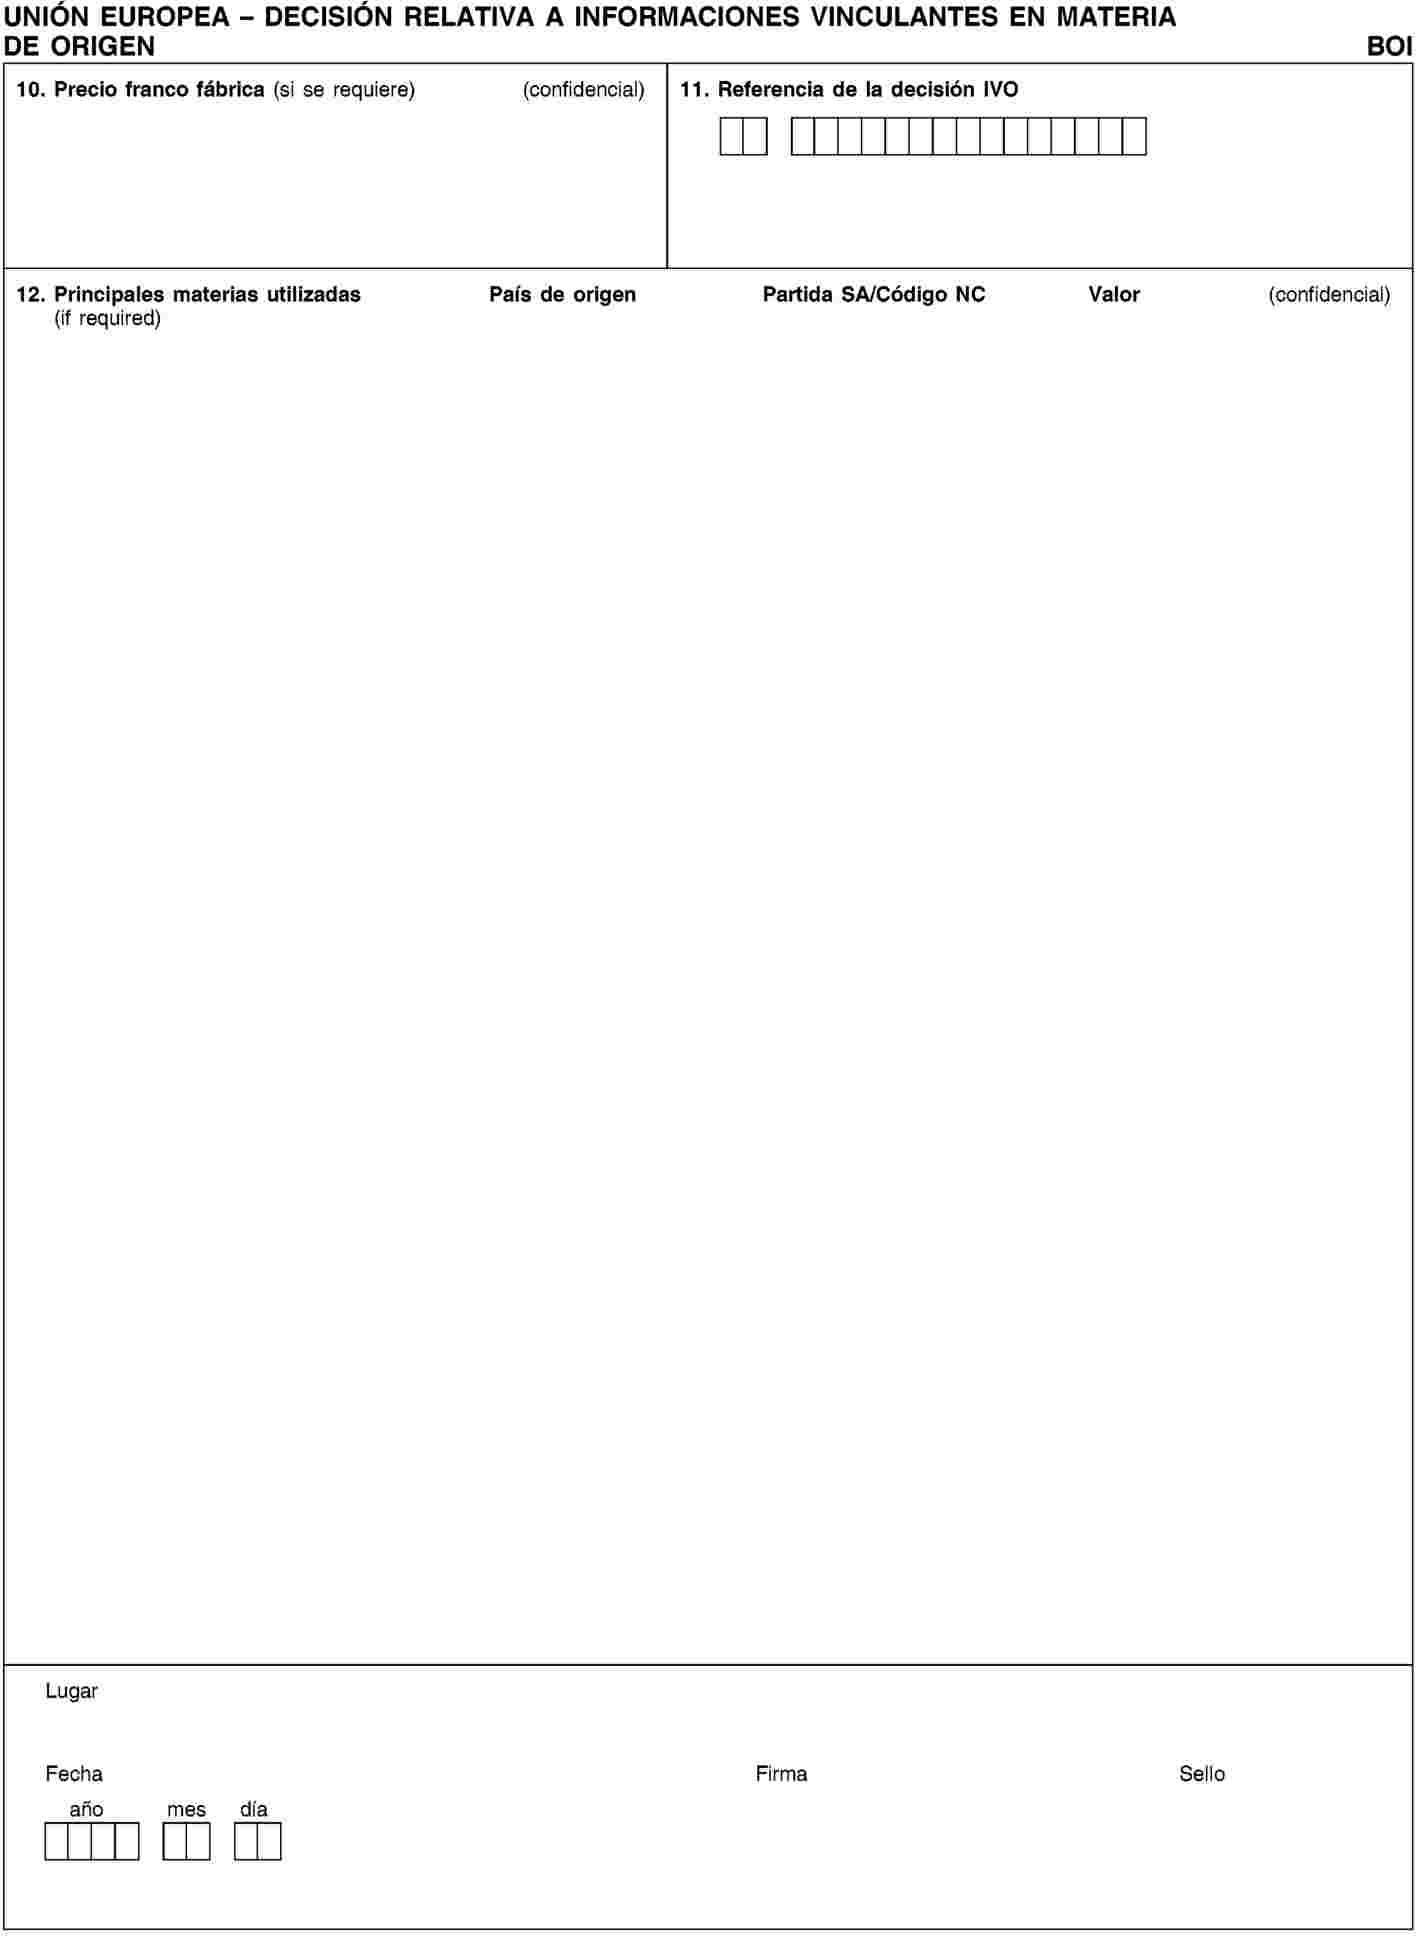 calendario 2019 para imprimir puerto rico mas recientemente liberado eur lex r2447 sv eur lex of calendario 2019 para imprimir puerto rico